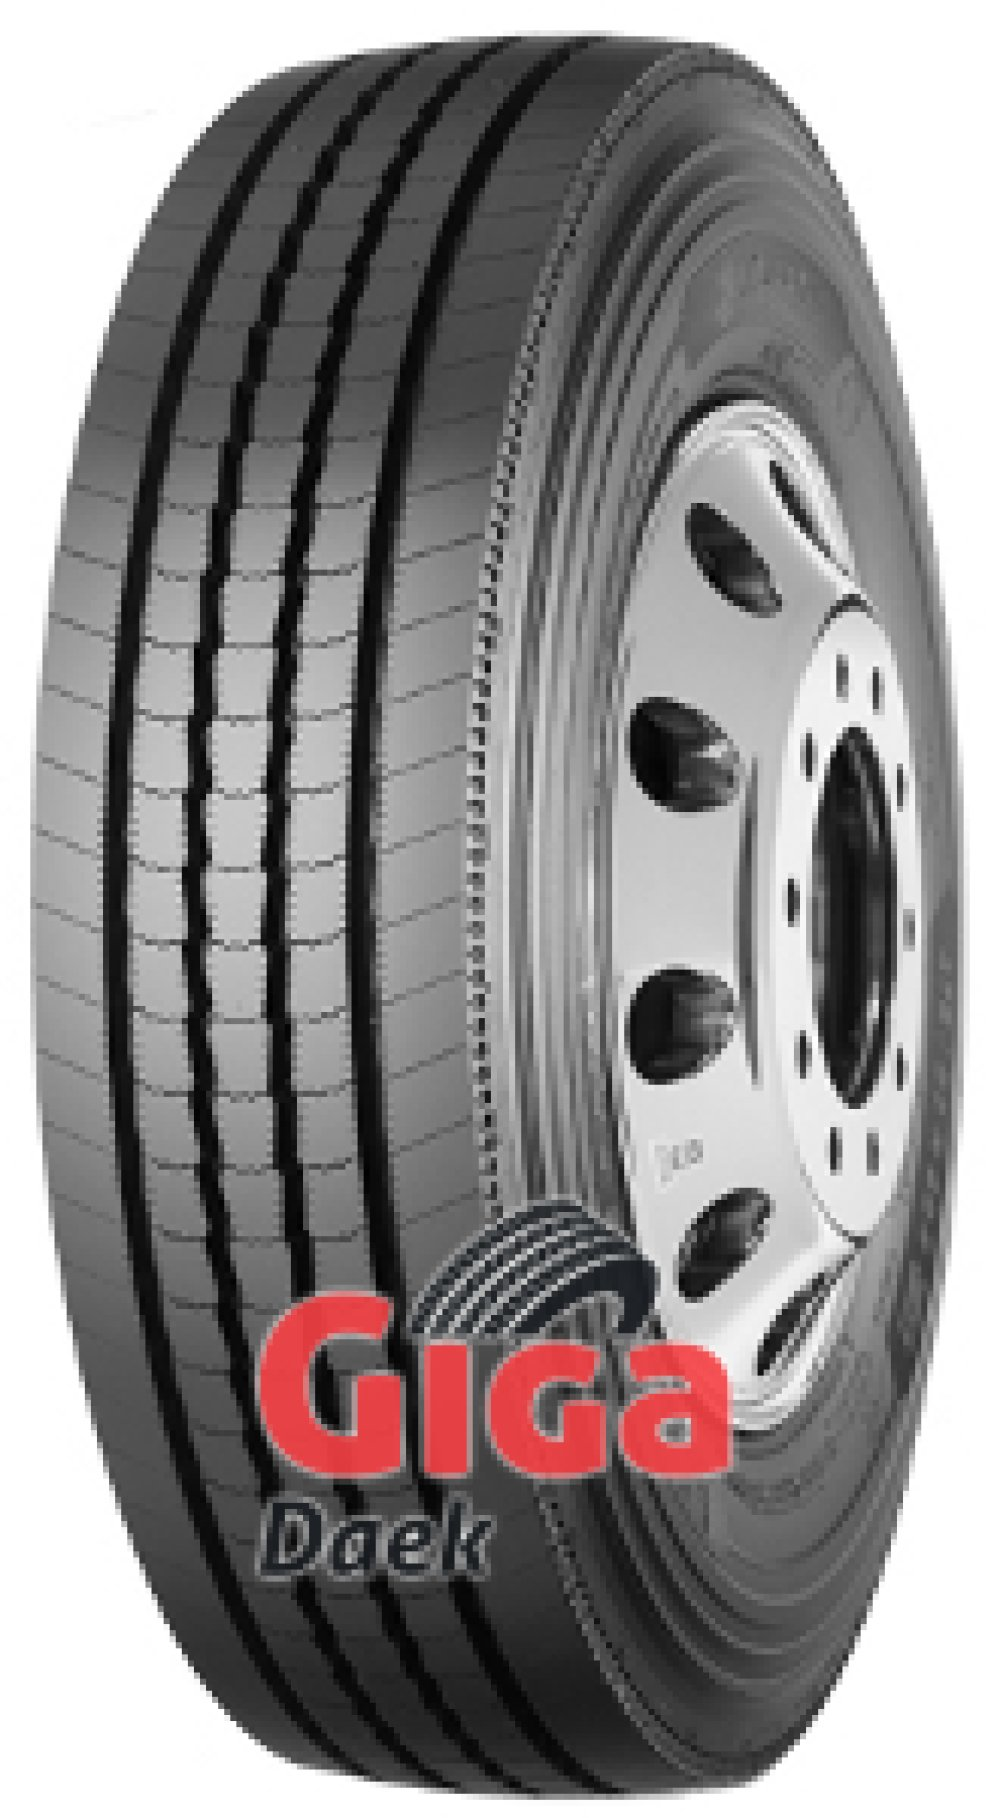 https://image.delti.com/tyre-pictures/h300/Brands/Goodyear/169/Profil_vector4seasonsg2_WM.jpg